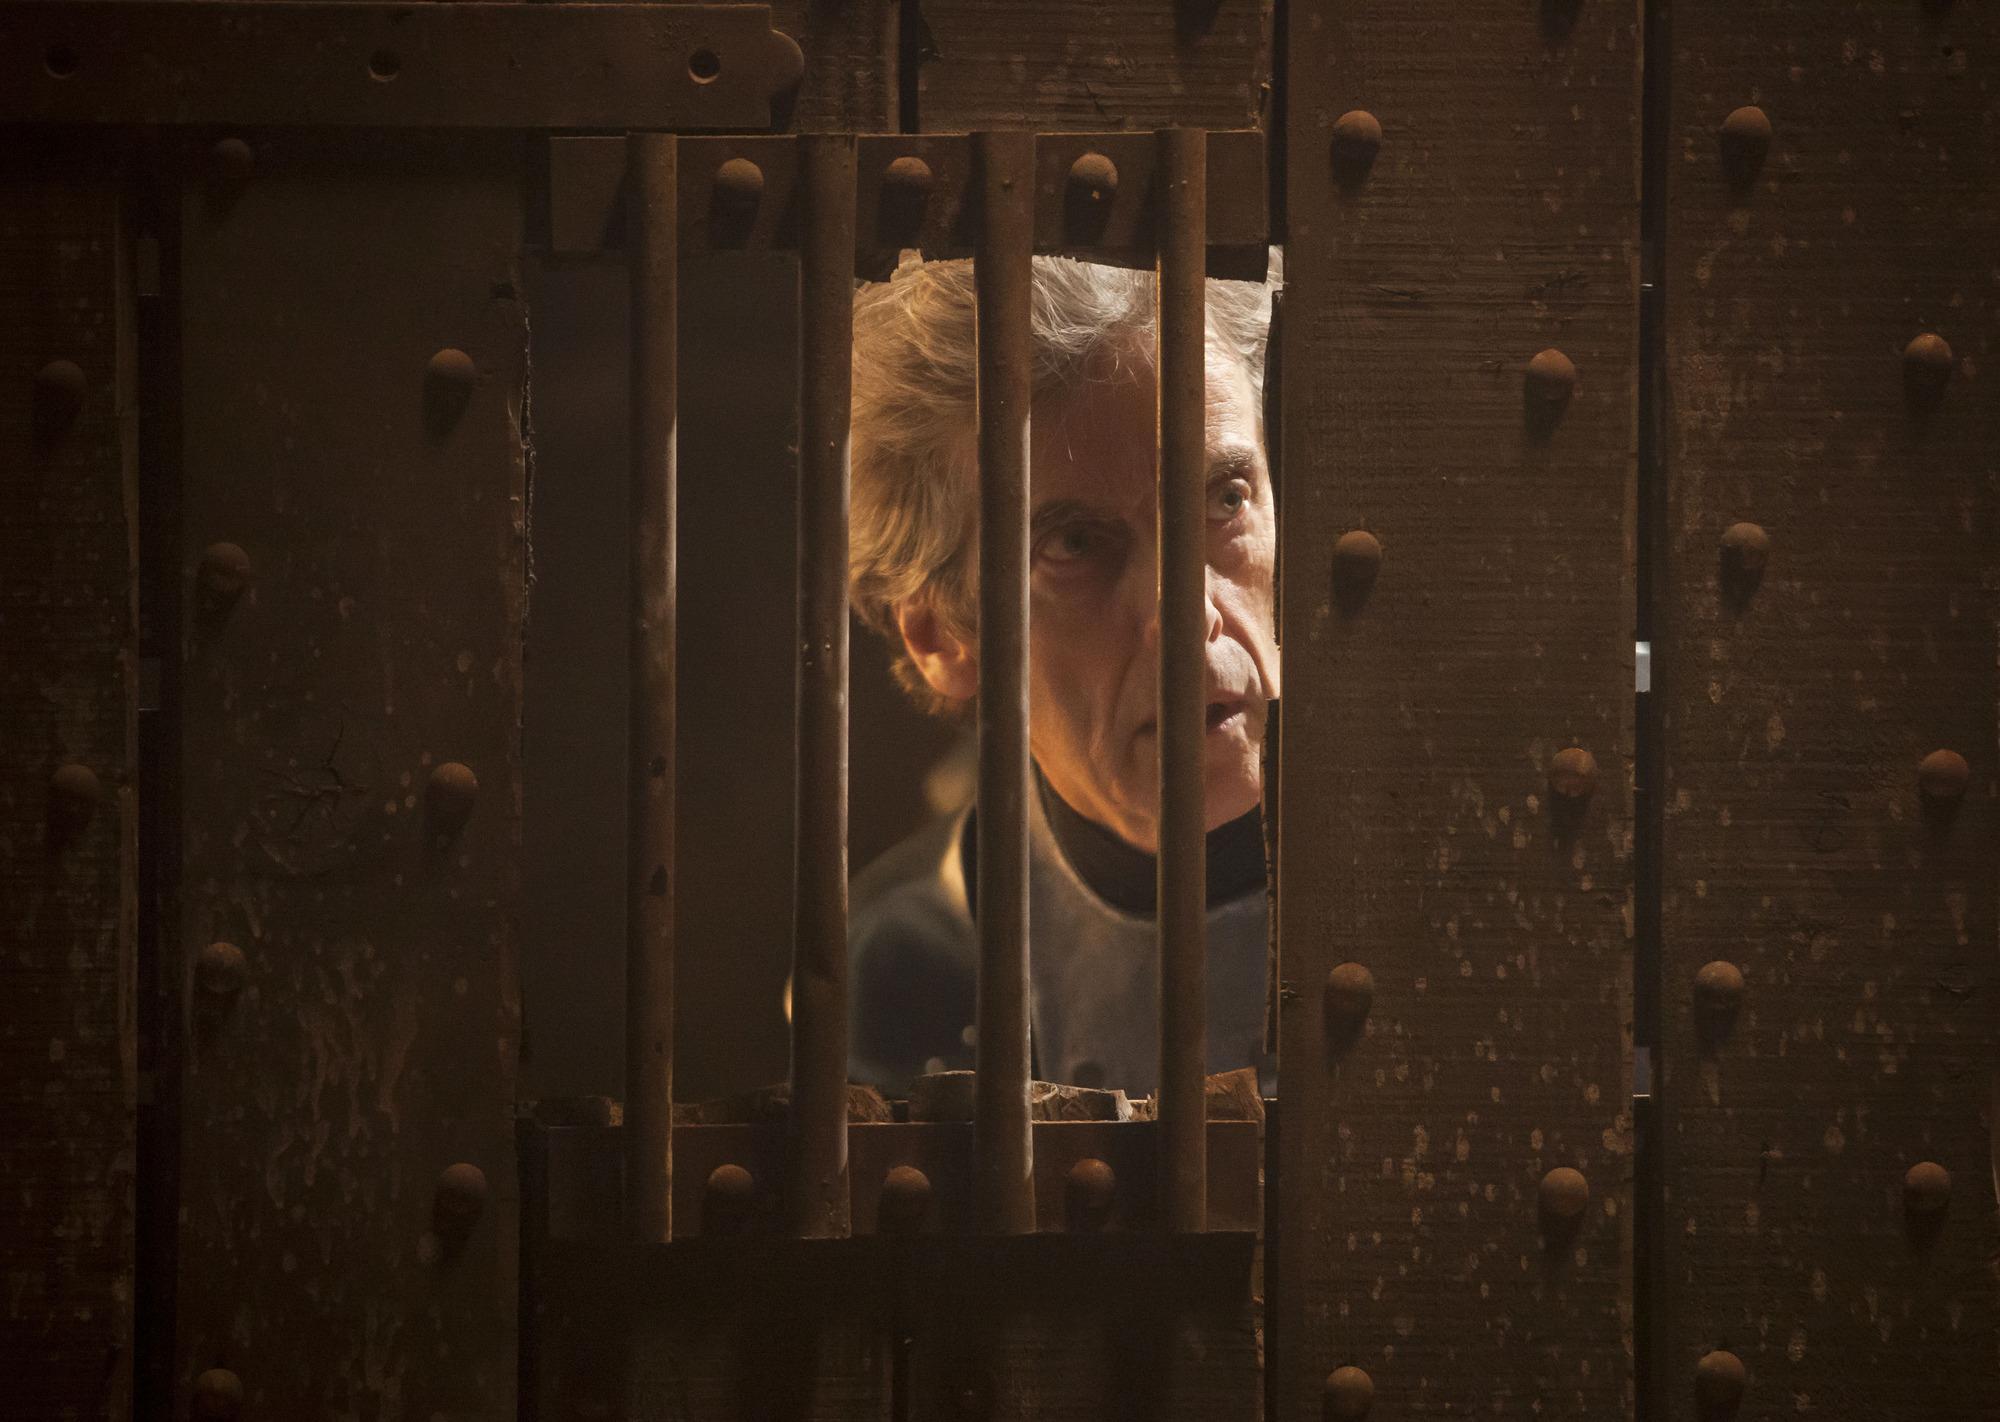 Empress of Mars: The Doctor (Peter Capaldi) (Credit: BBC/BBC Worldwide (Jon Hall))